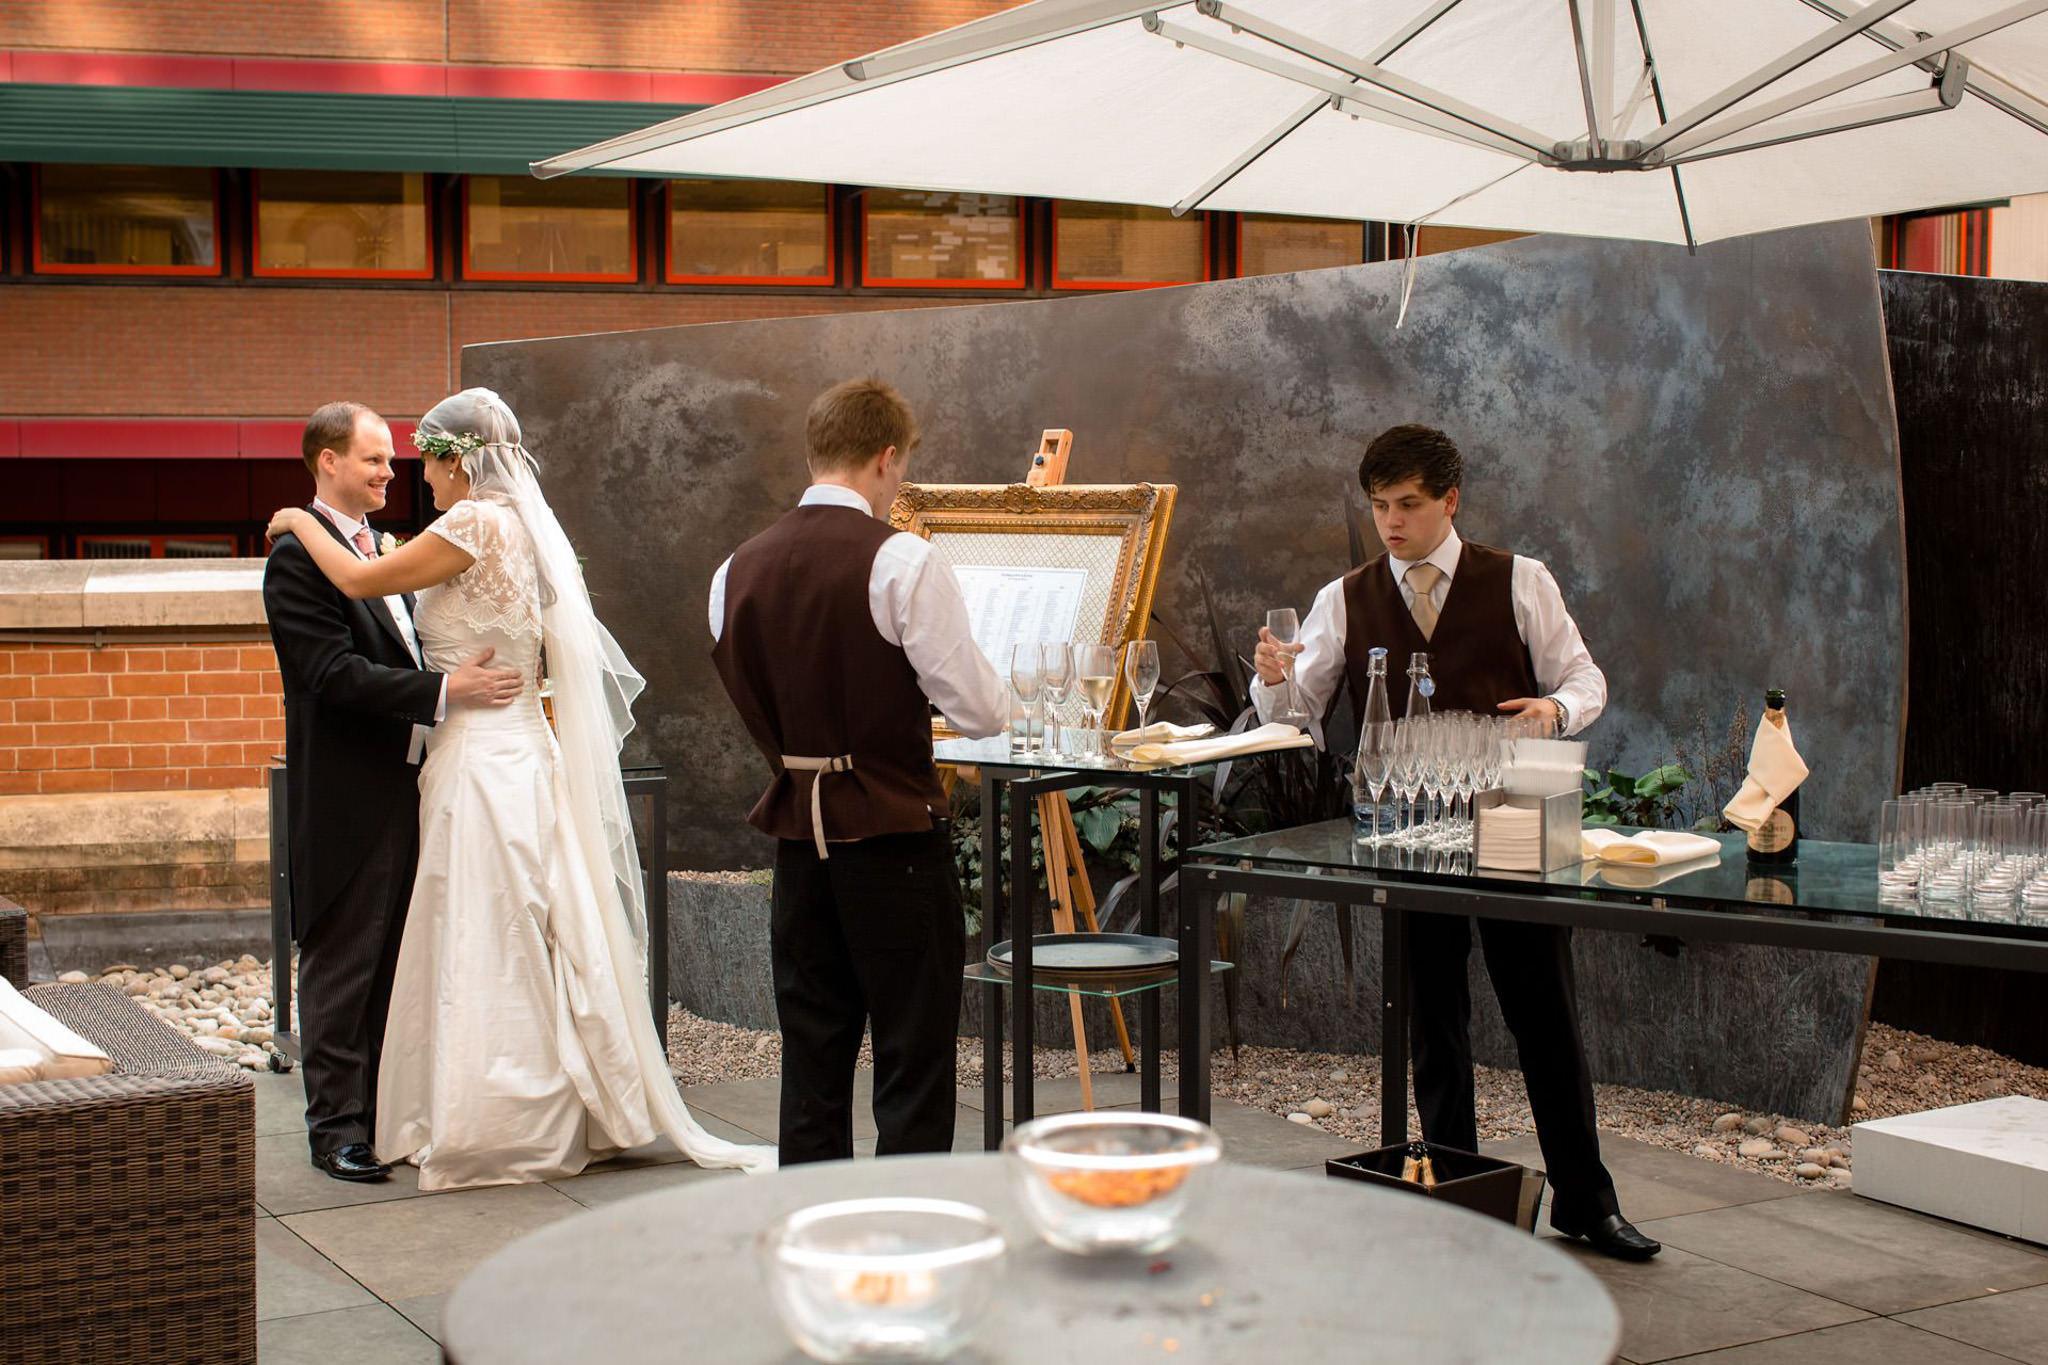 St. Pancras hotel wedding reception food